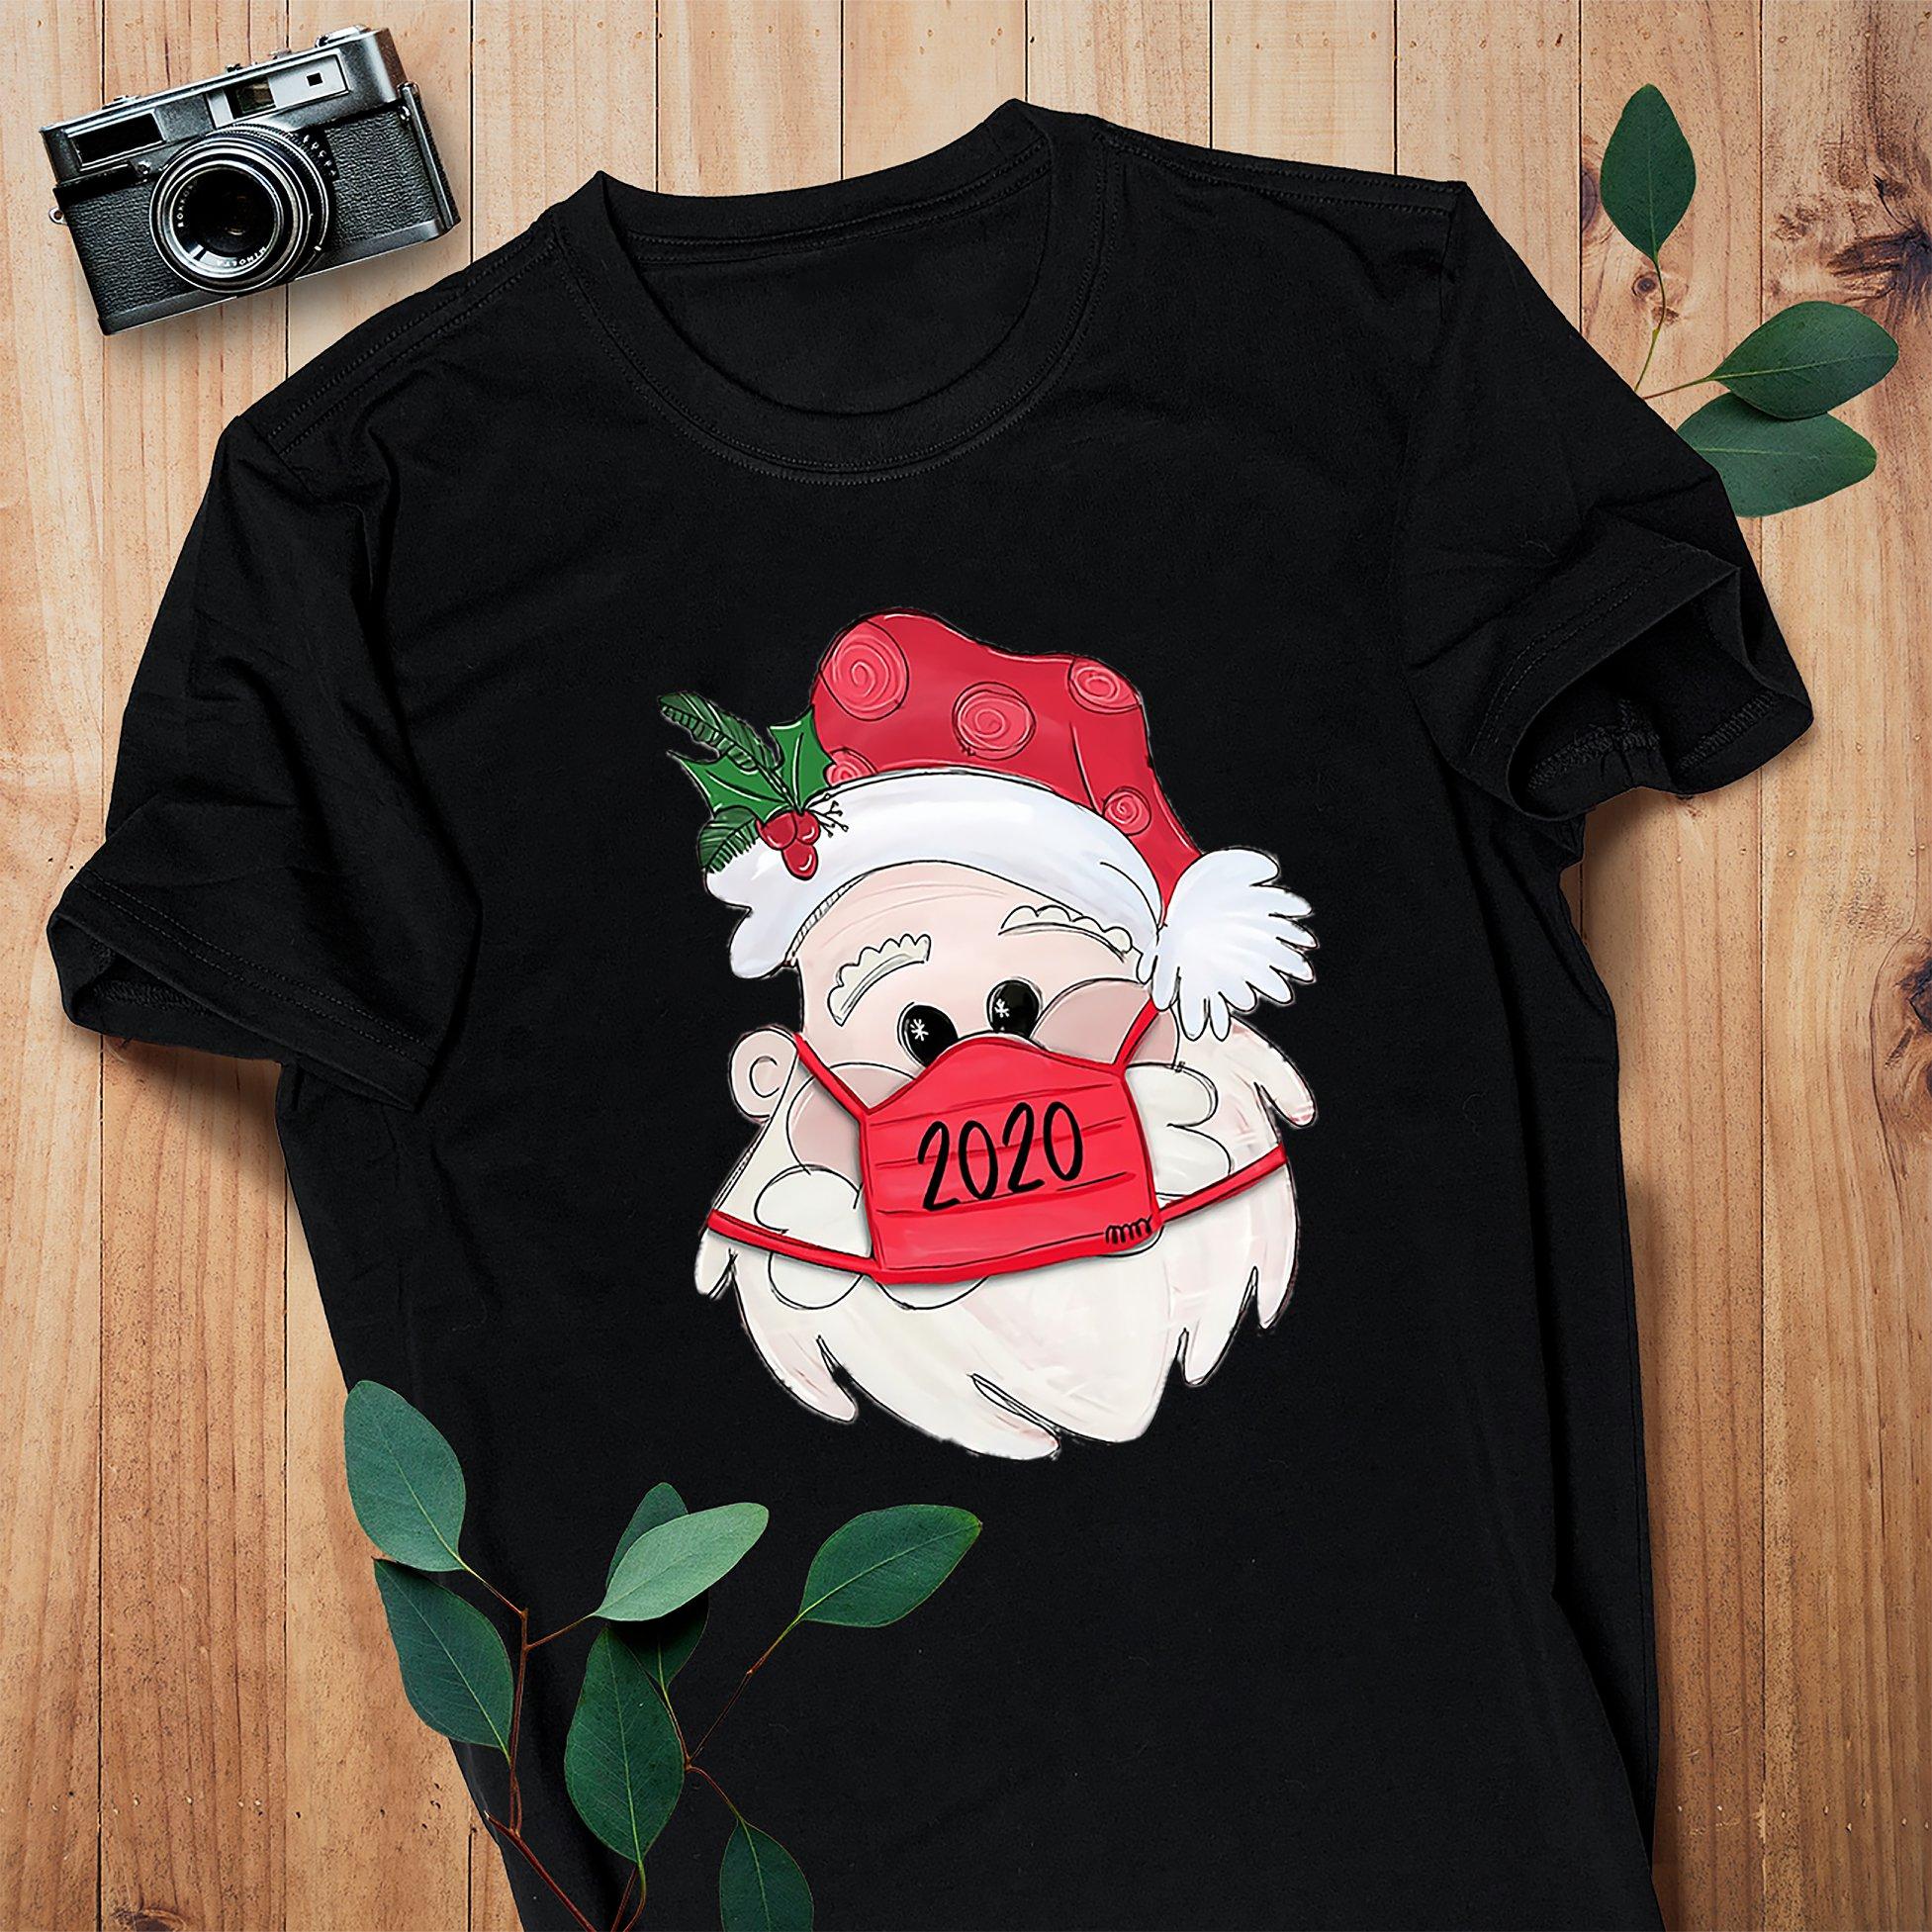 Santa face mask shirt